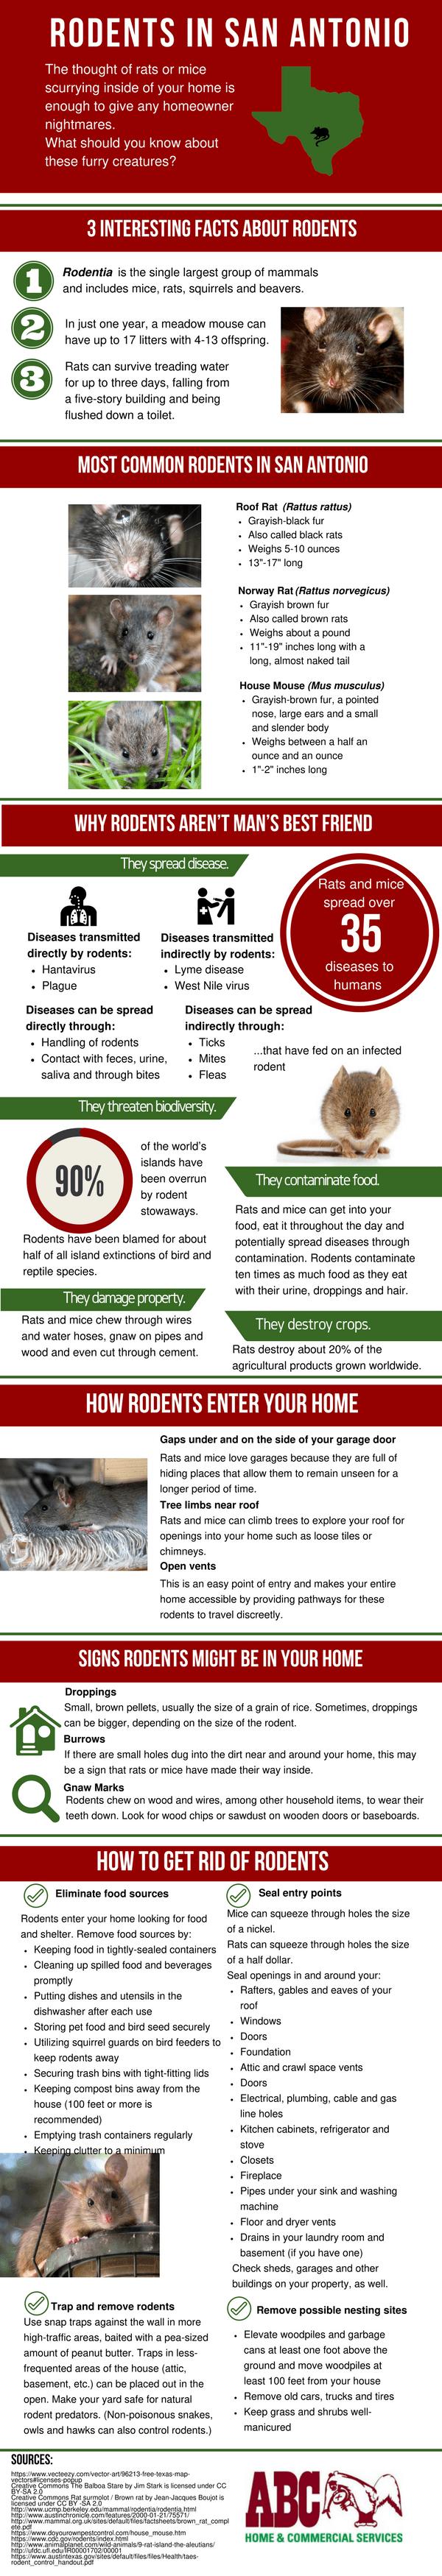 San Antonio Rodents Infographic Abc Blog